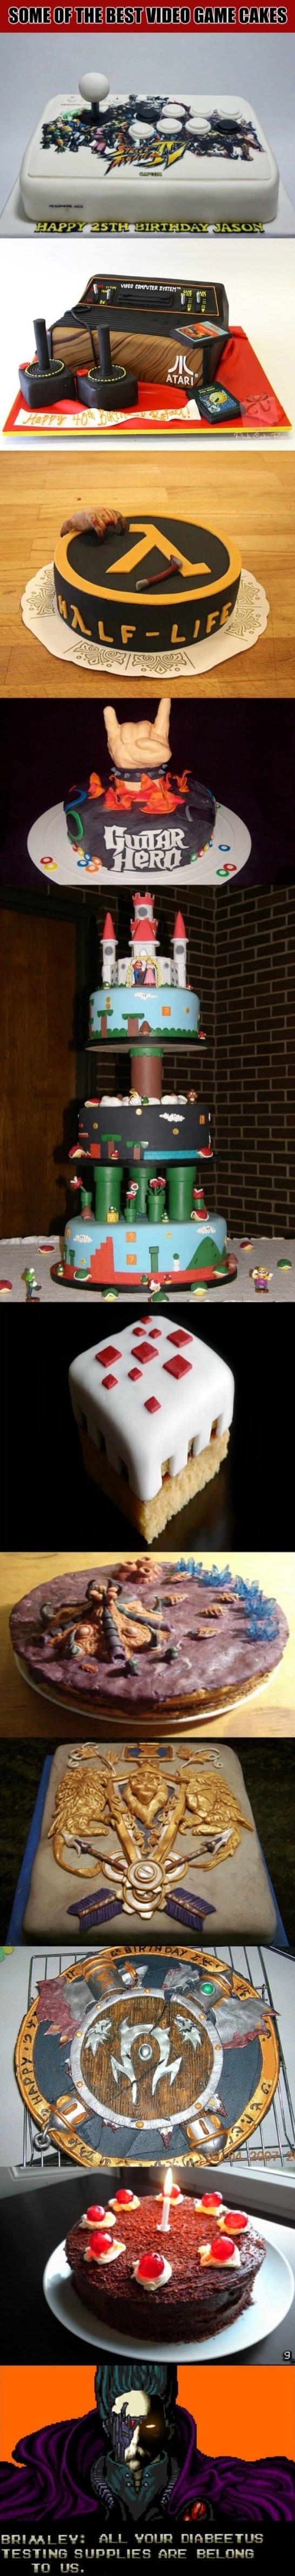 joke-2014-best-video-game-cakes